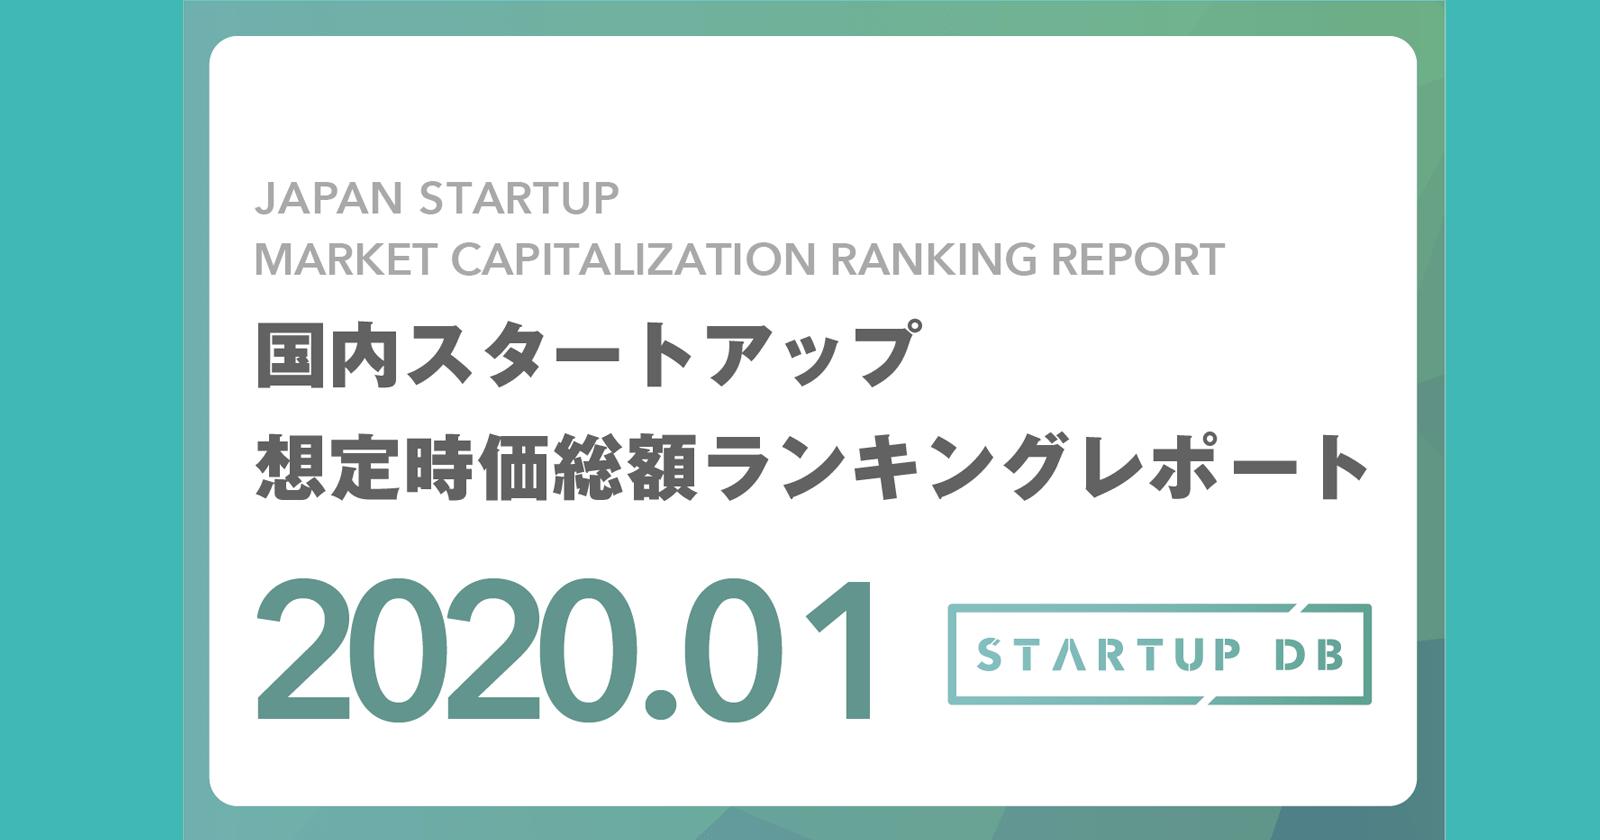 【STARTUP DB】調査結果 国内スタートアップ想定時価総額ランキングTOP50(2020年1月)  国内ユニコーン企業数6社に